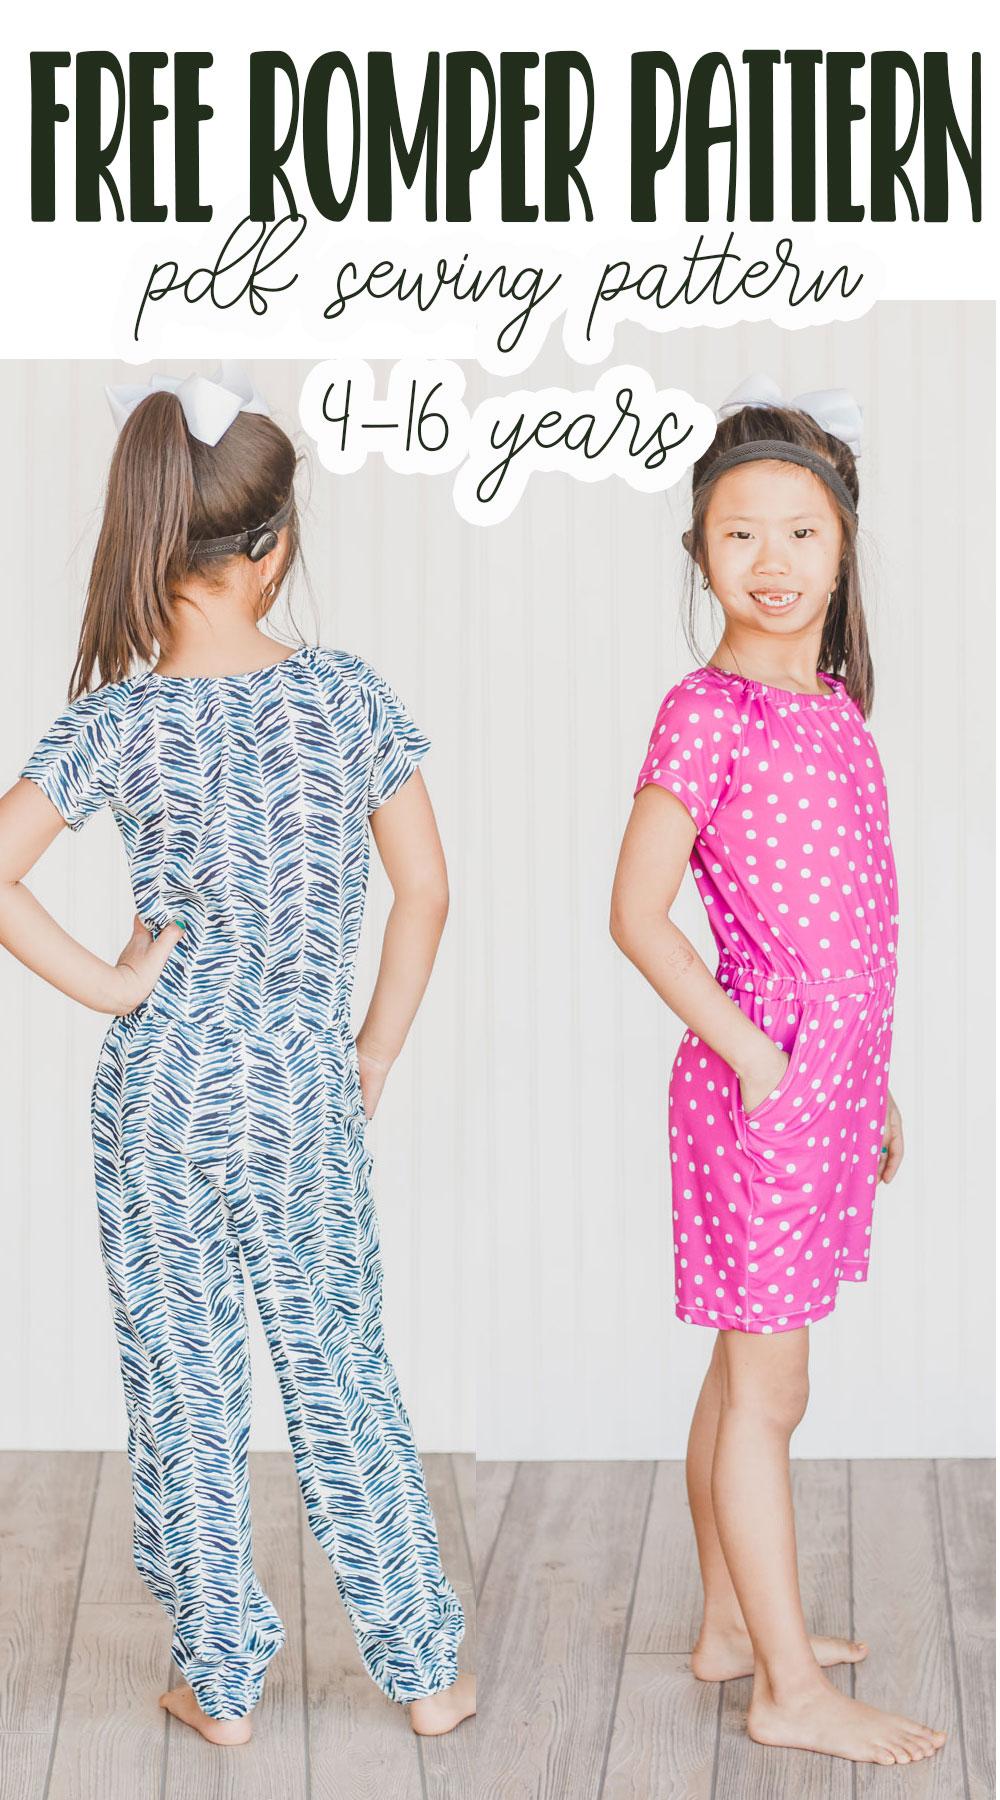 sew a girls romper with a free pdf pattern